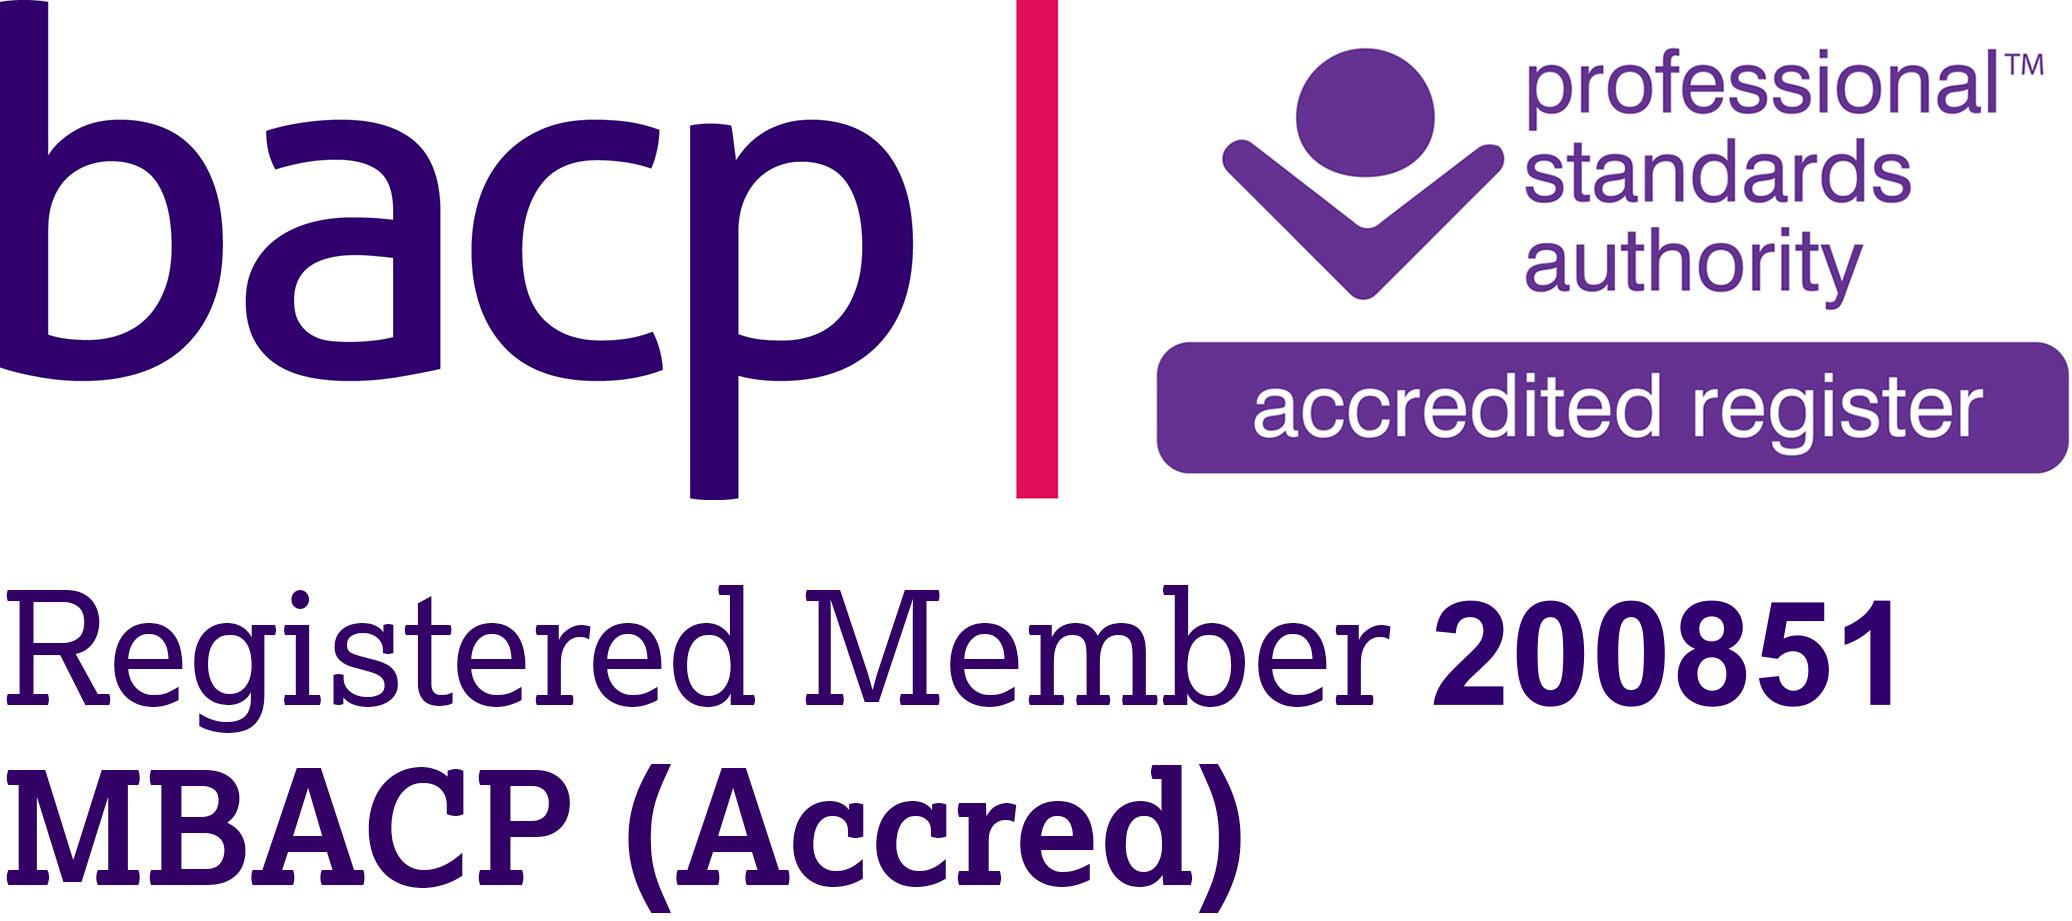 BACP Logo - 200851-2